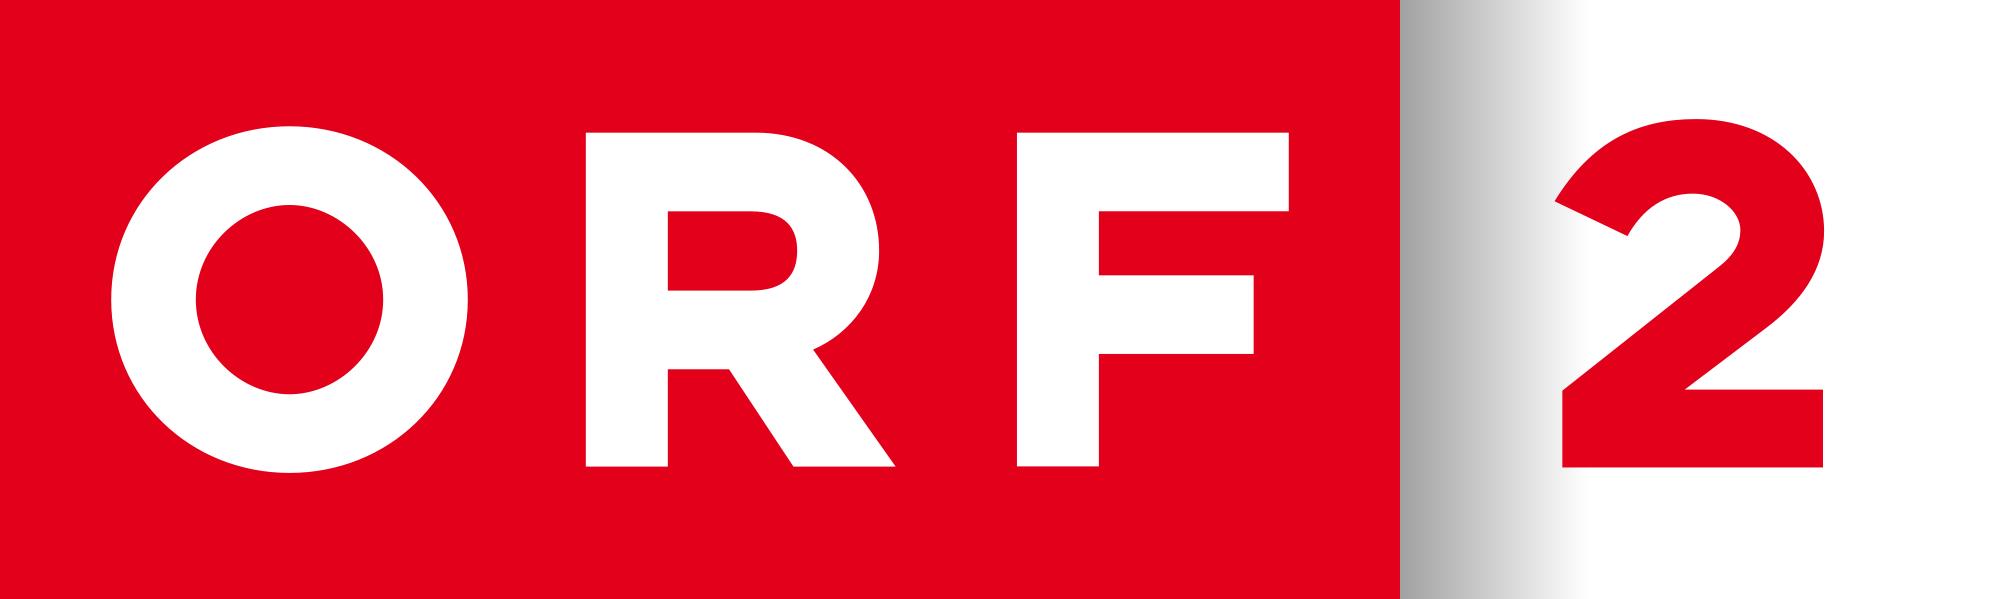 ORF2 - heute konkret